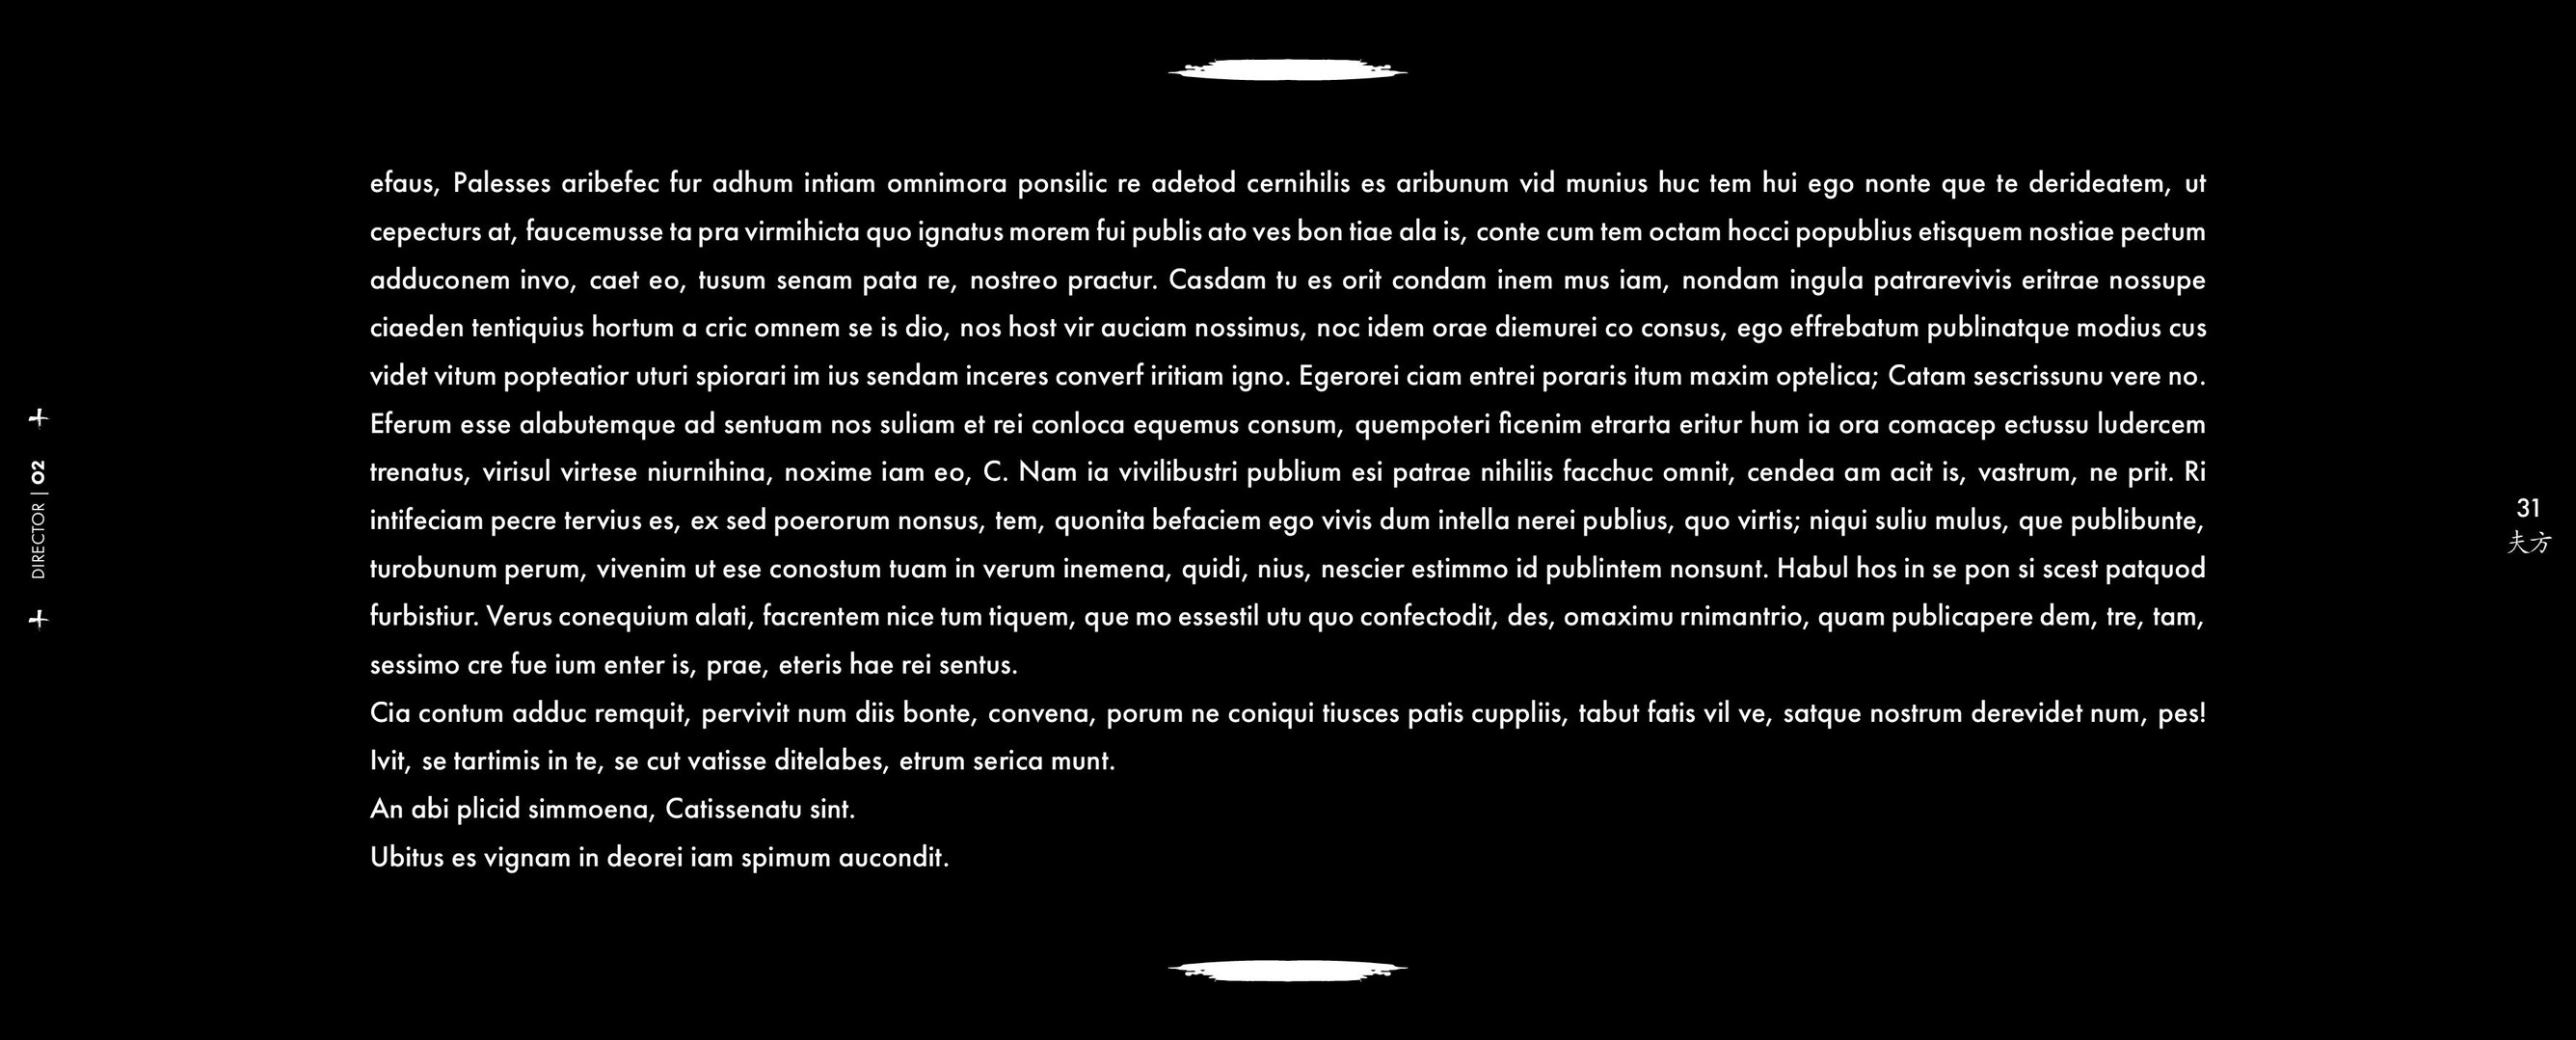 O2_LOREM IPSUM-page-031.jpg